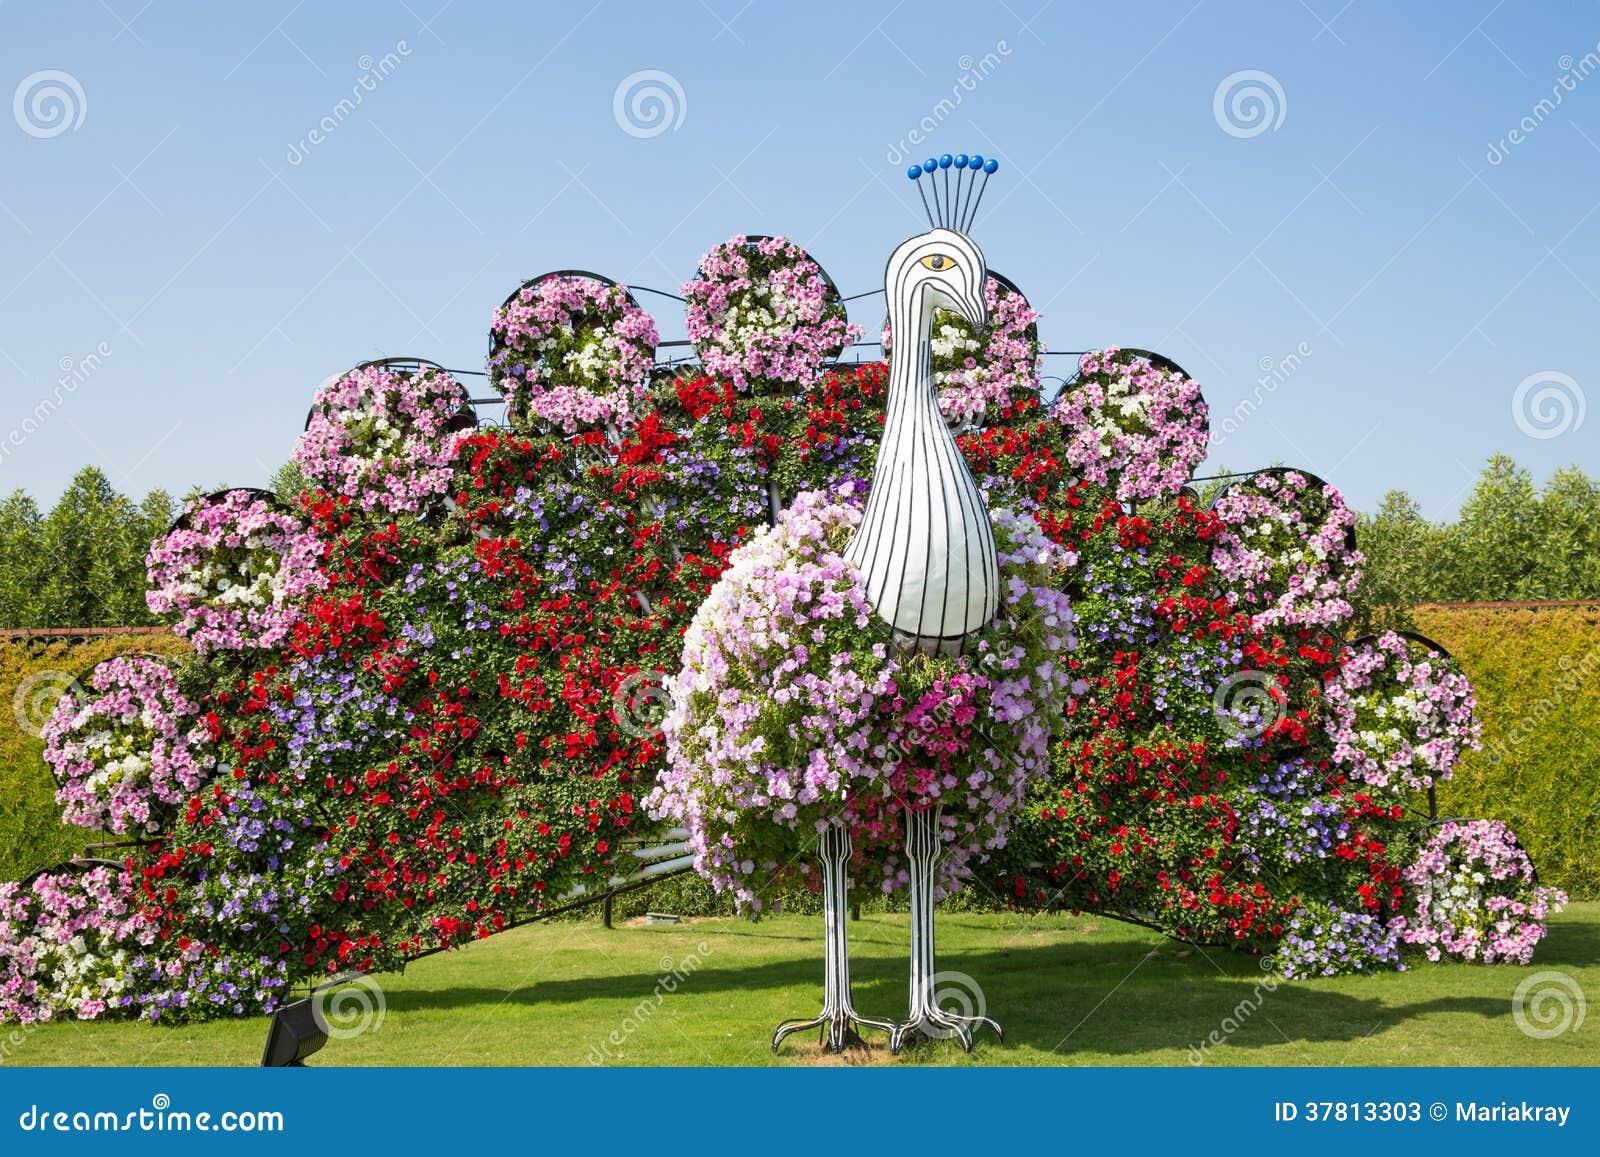 DUBAI, UAE - JANUARY 20: Miracle Garden In Dubai, On